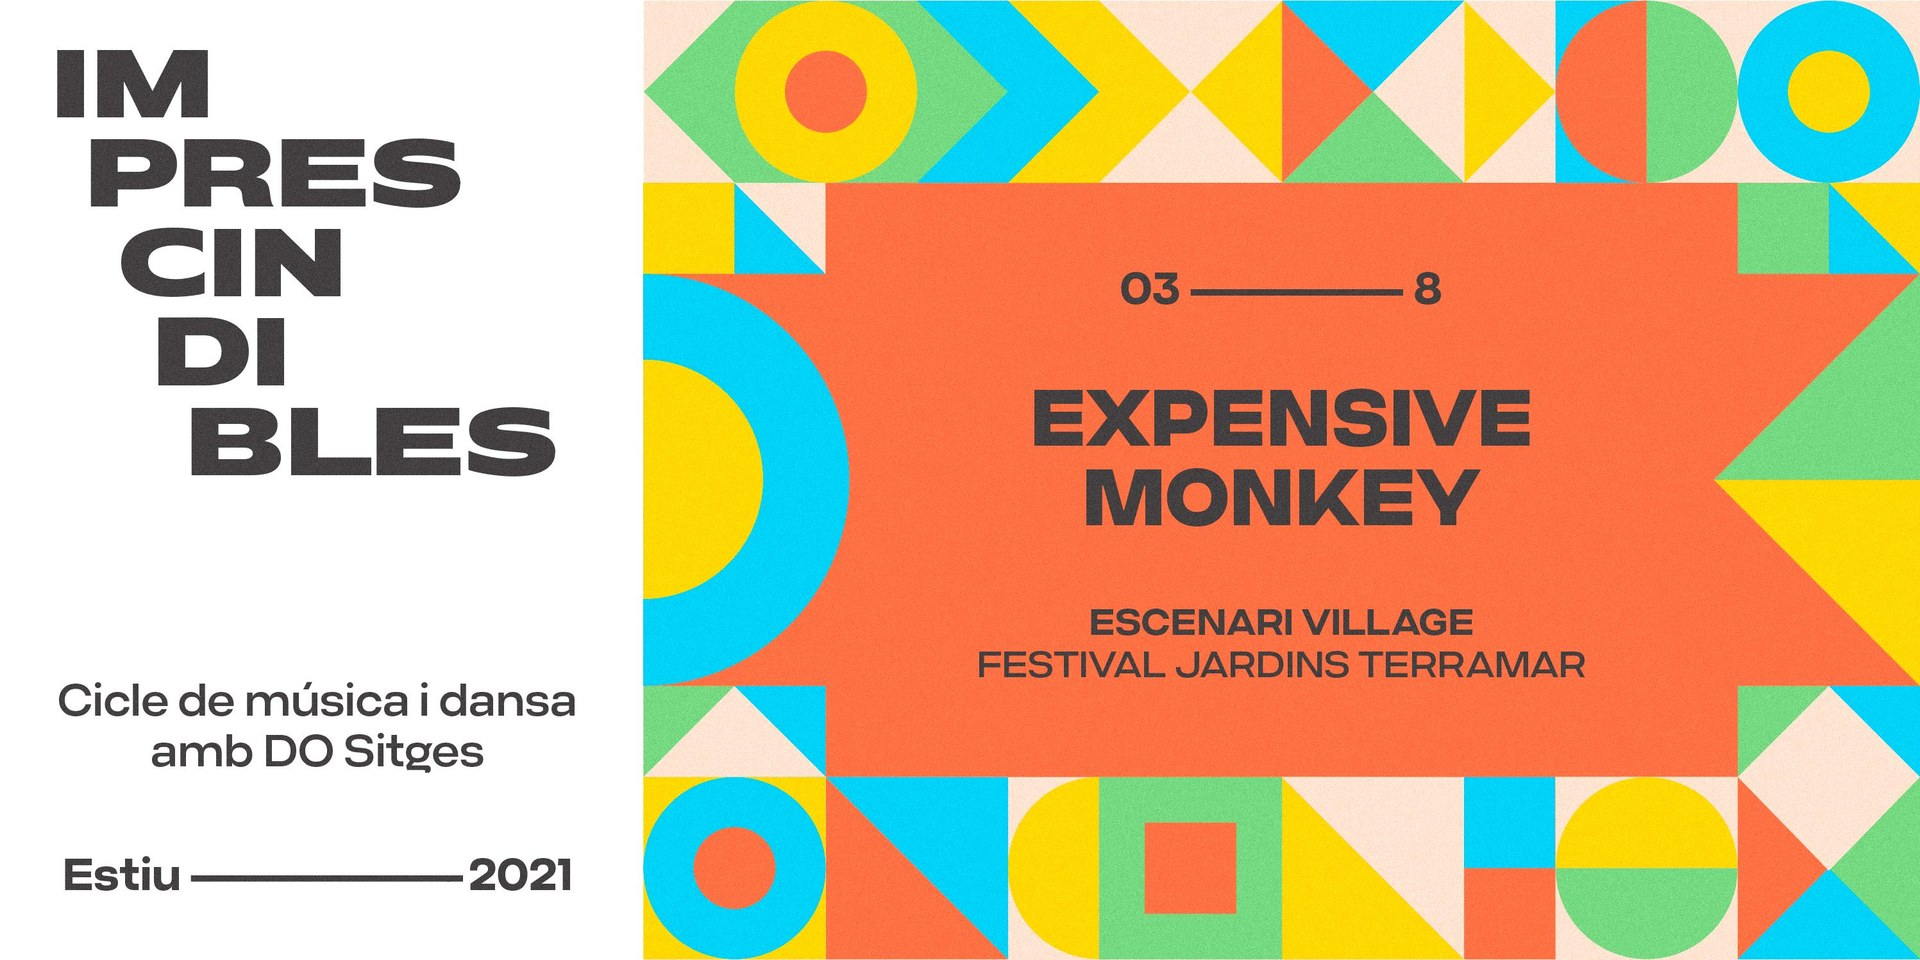 Concert d'Expensive Monkey